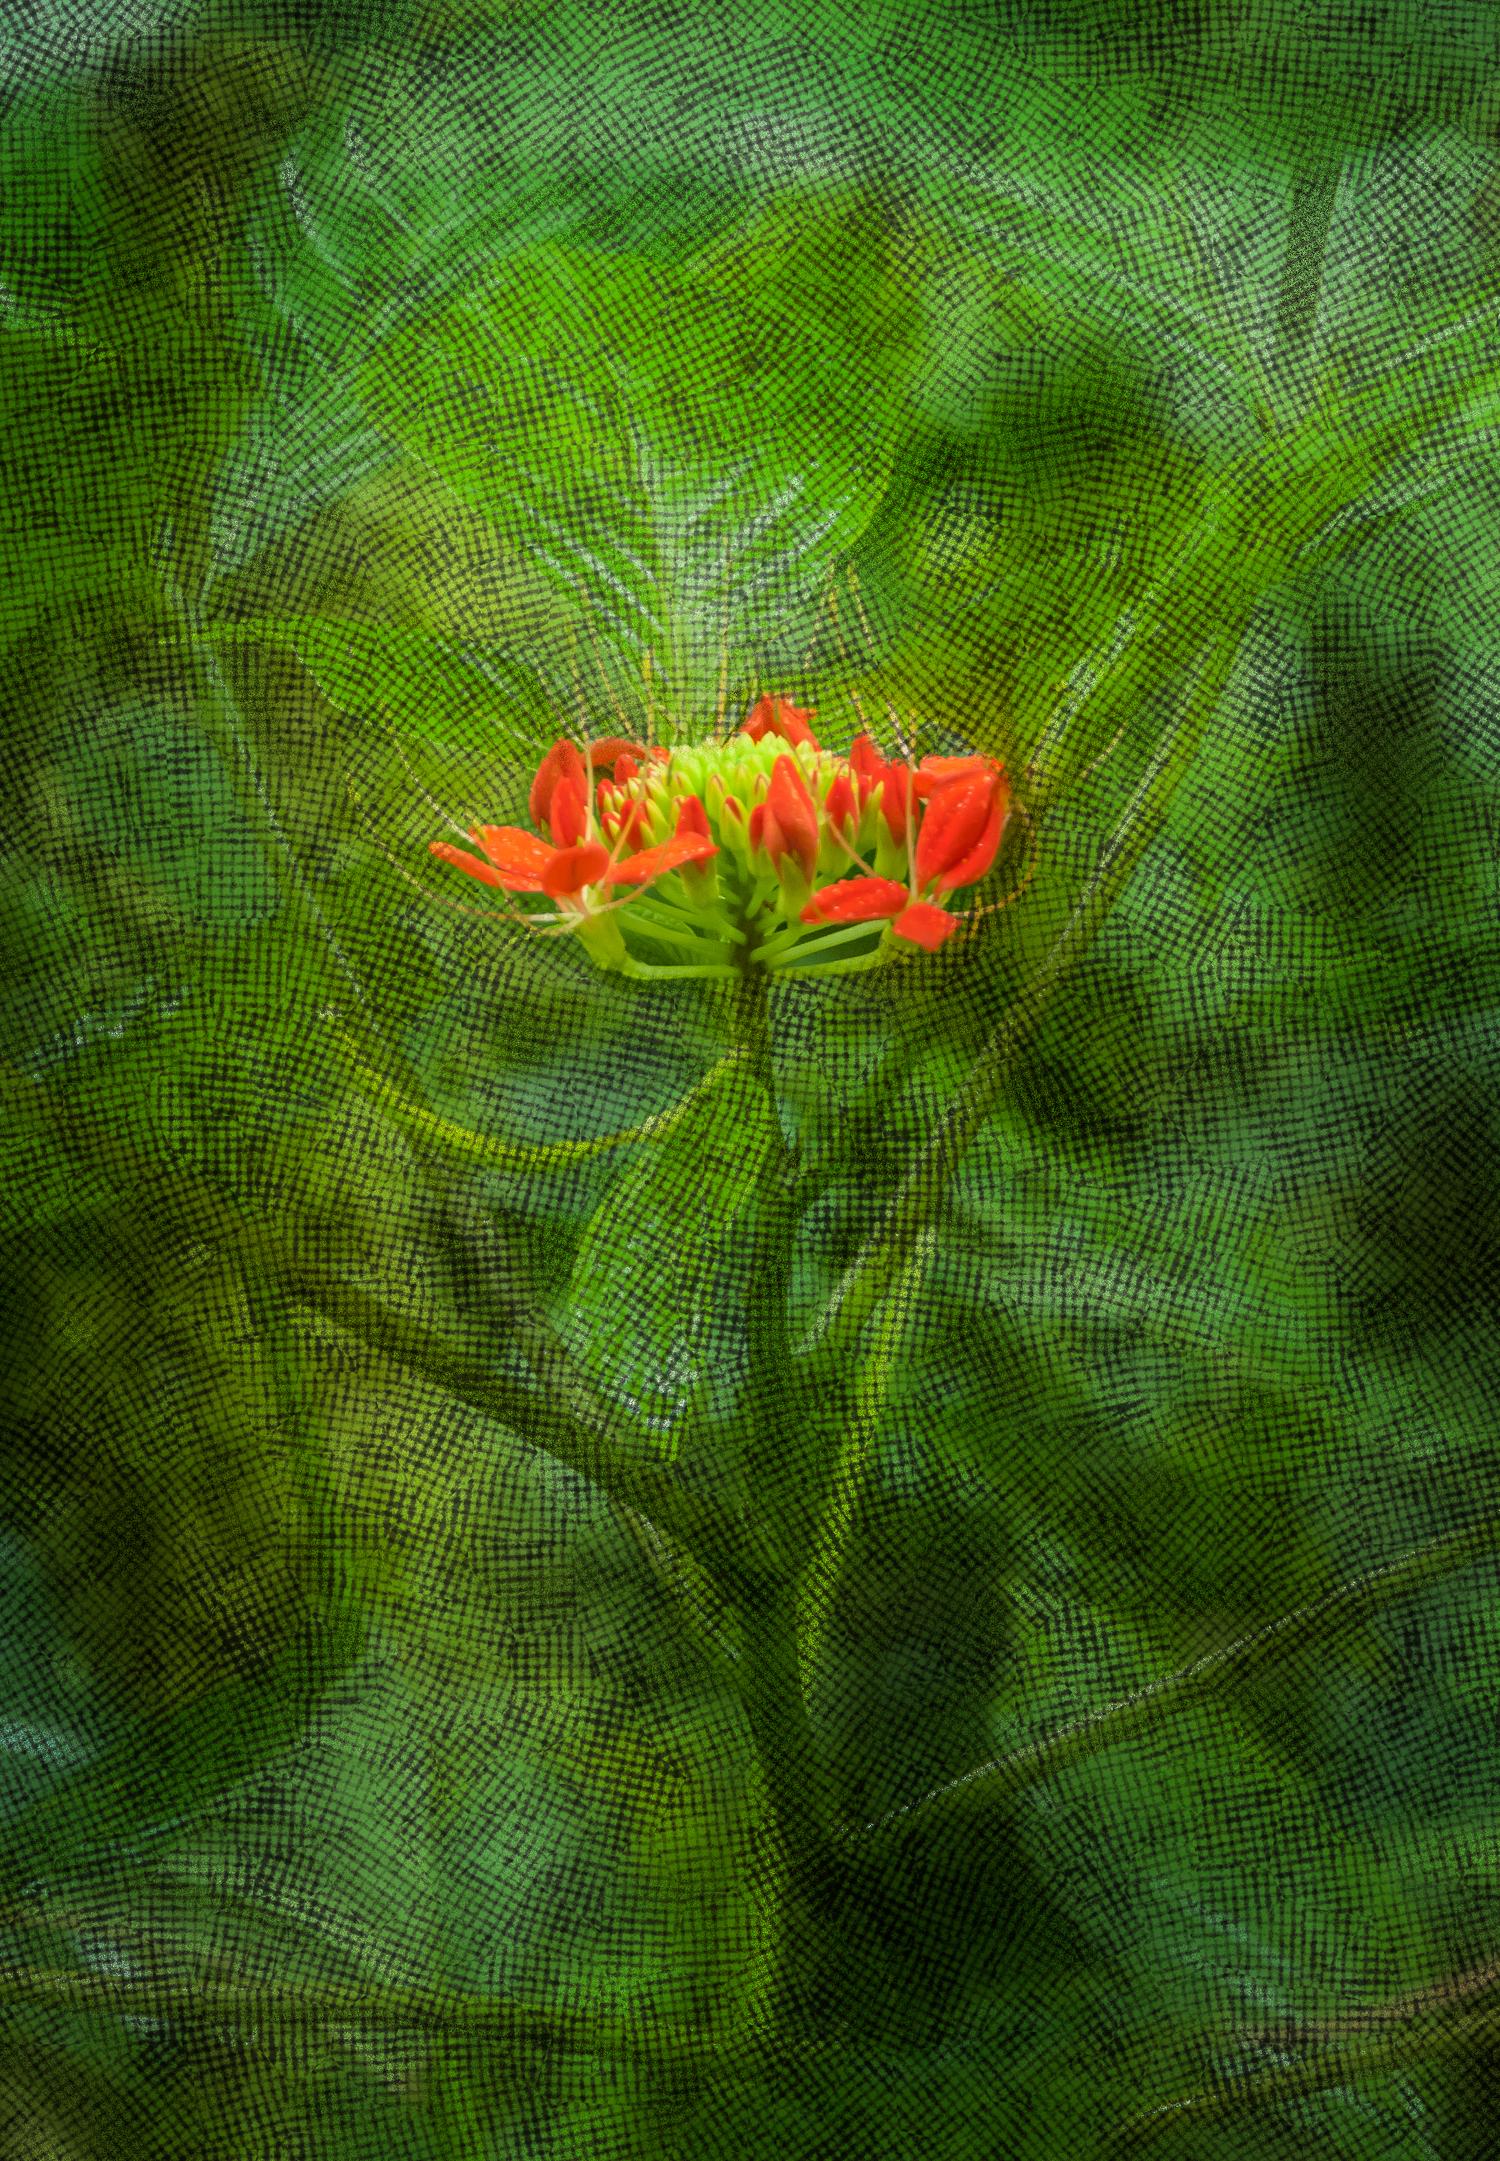 Flowers-_LGF3117-Edit.jpg